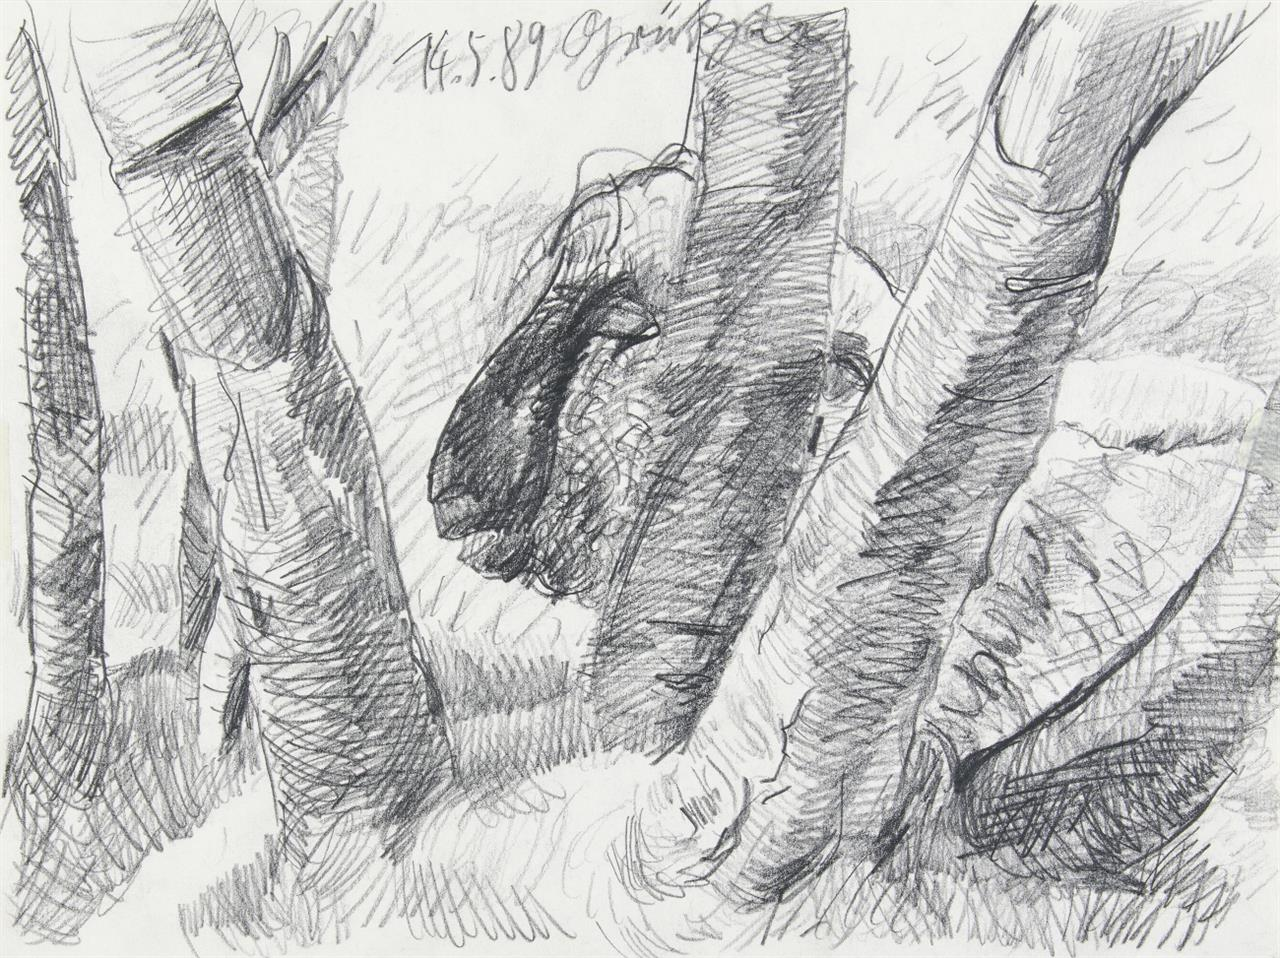 Johannes Grützke. Ohne Titel (Bäume). 1989. Bleistift. Signiert.